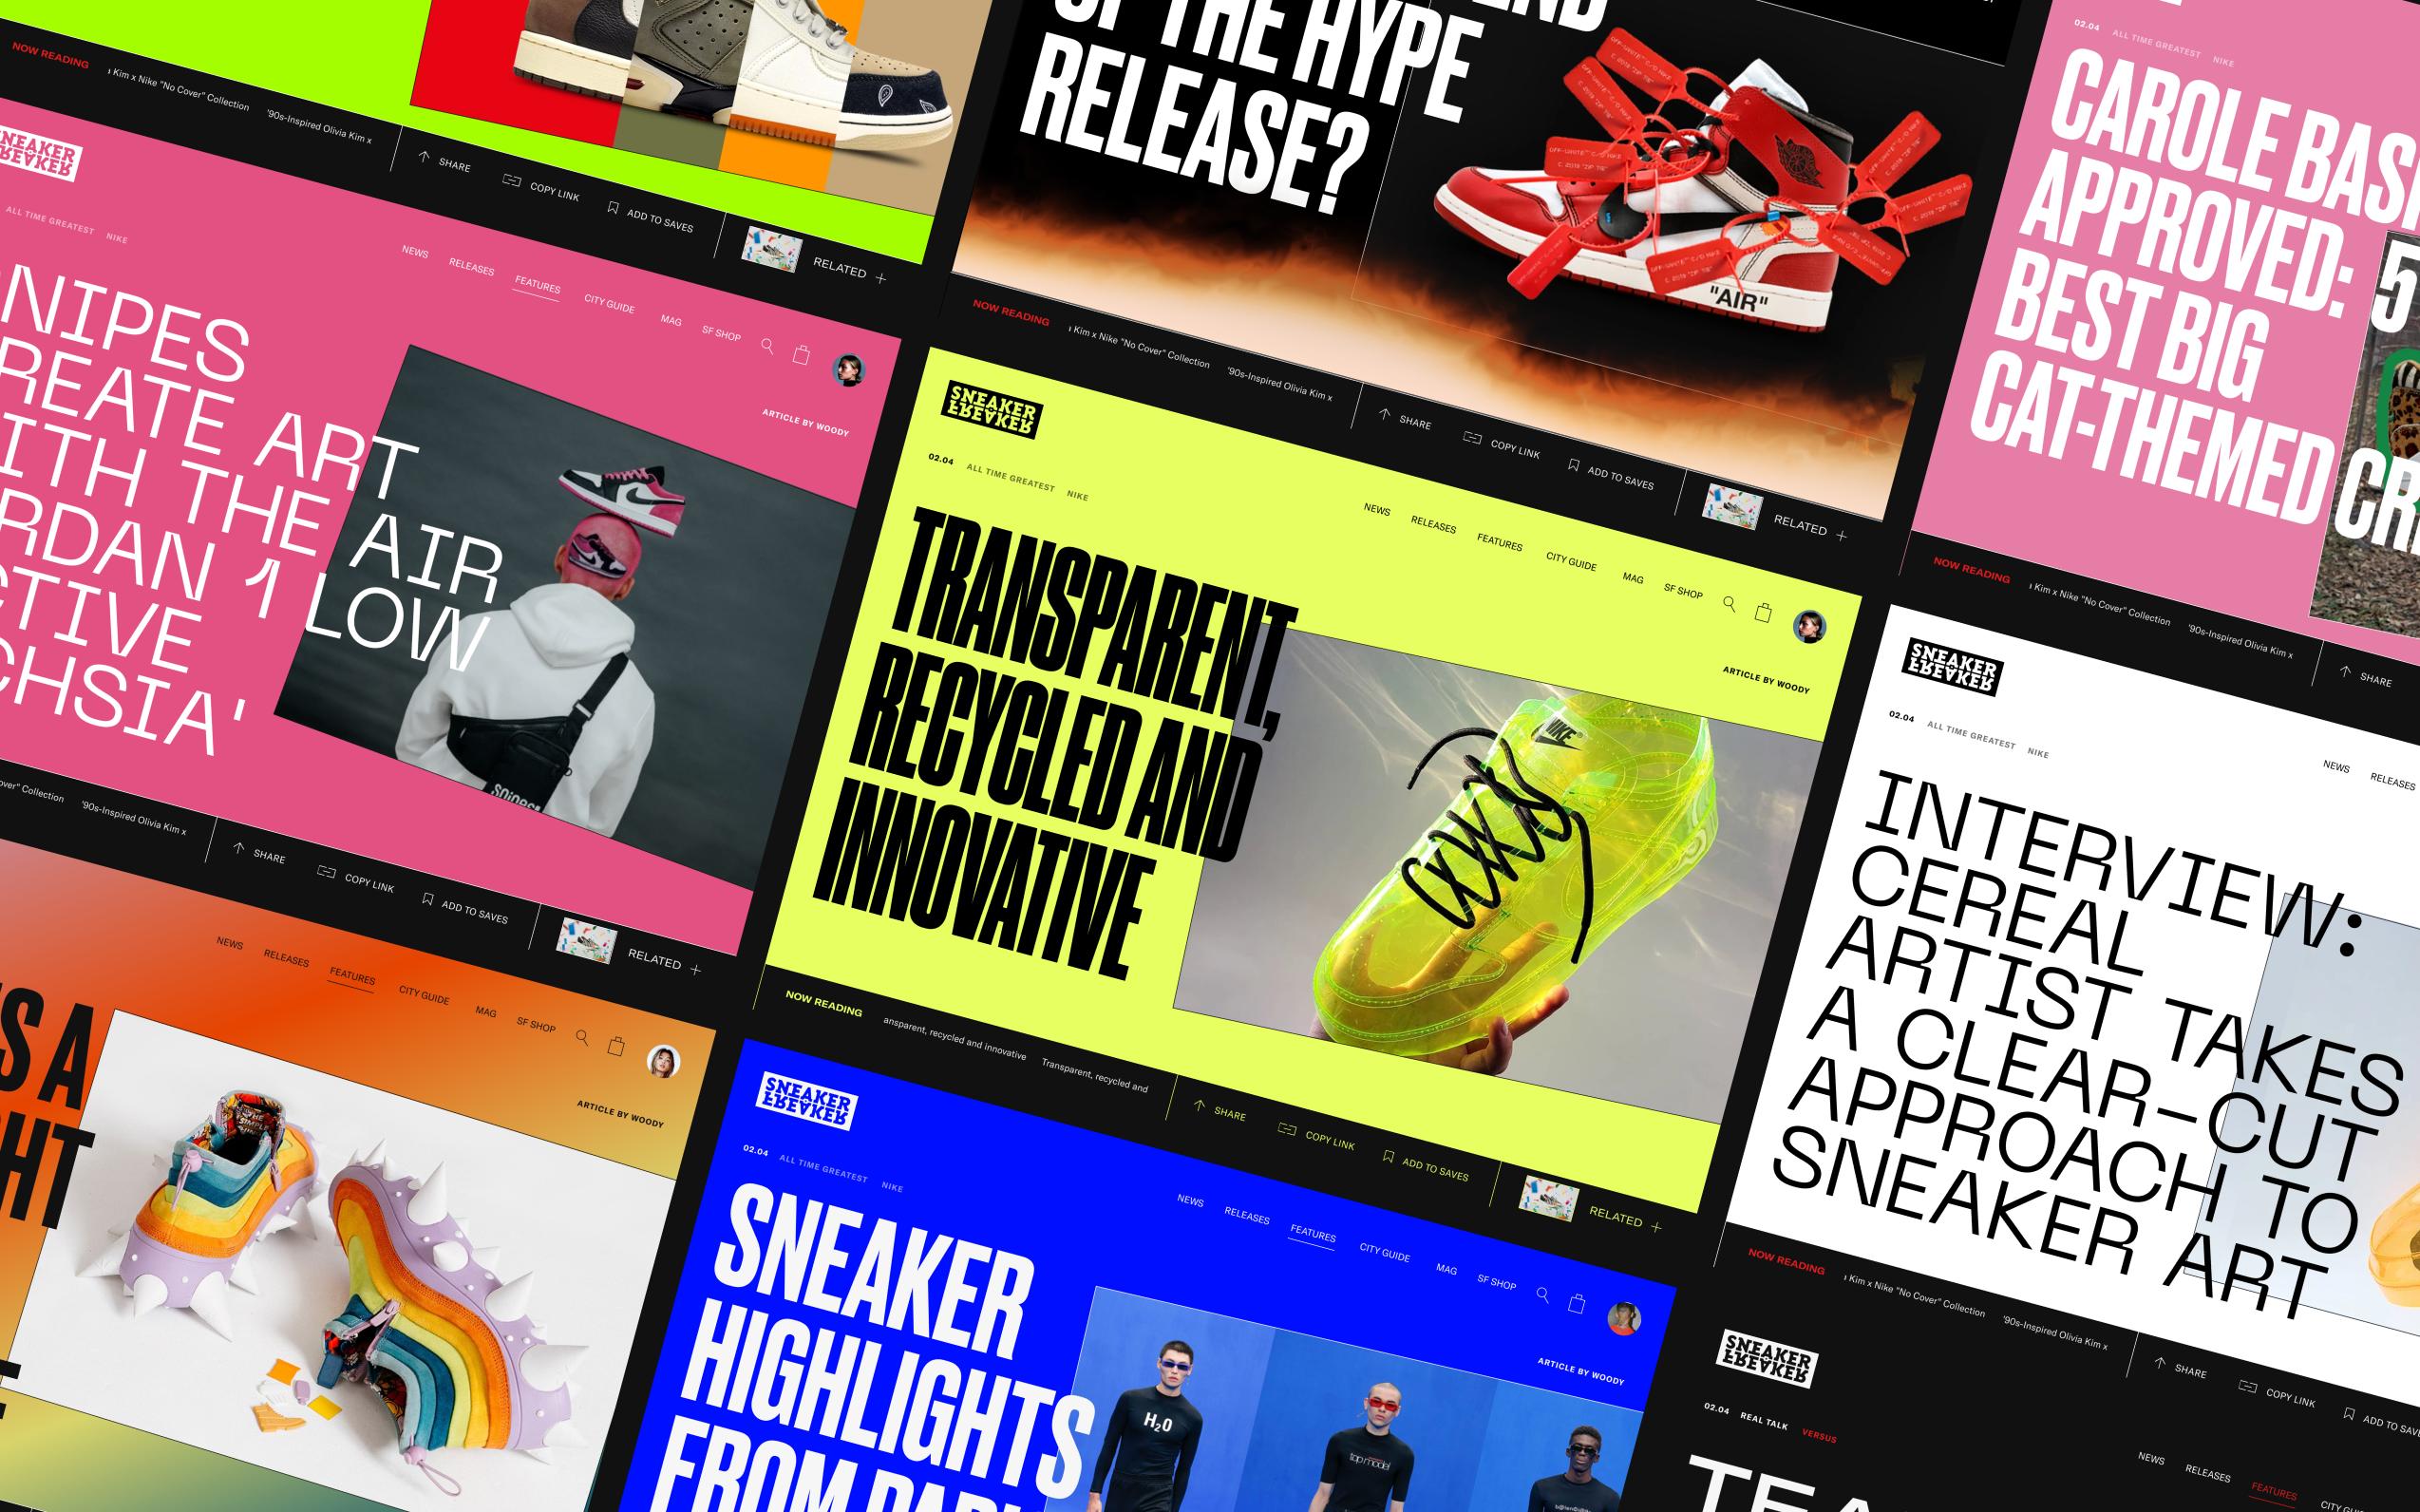 Large grid of sneaker freaker article hero's taken from the website